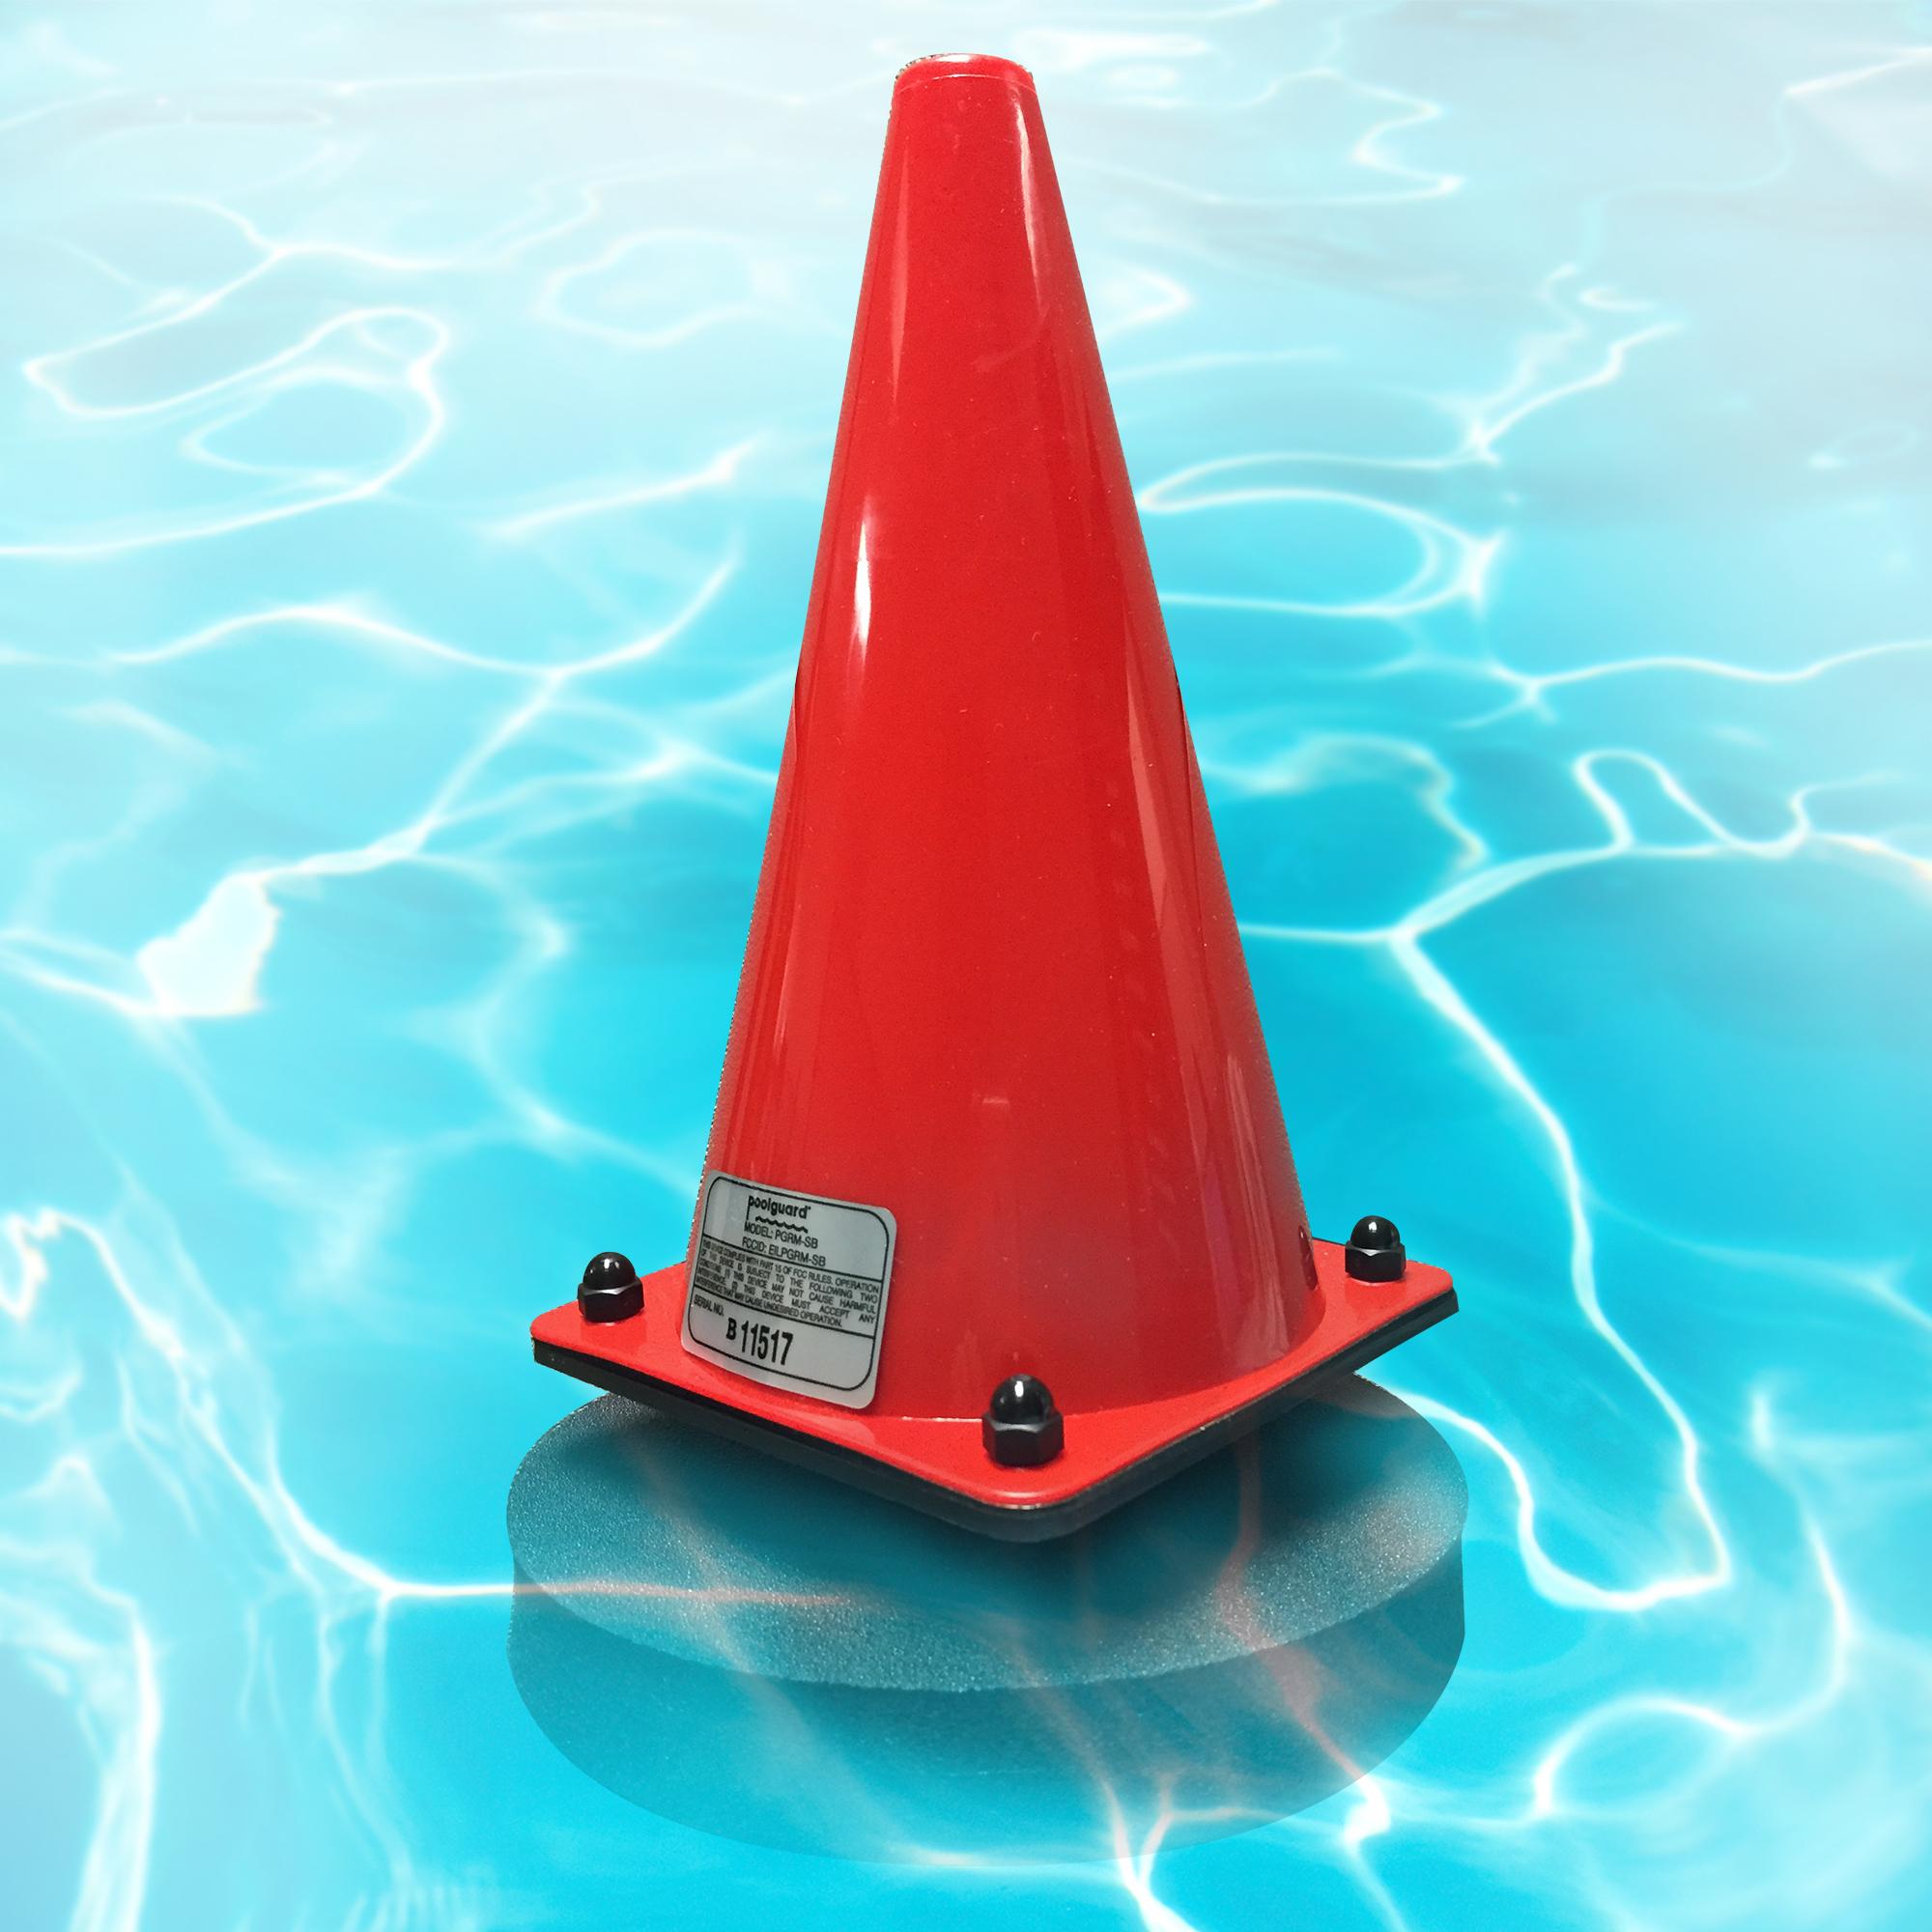 Best Pool Alarm Reviews Poolguard Buoy Reviews